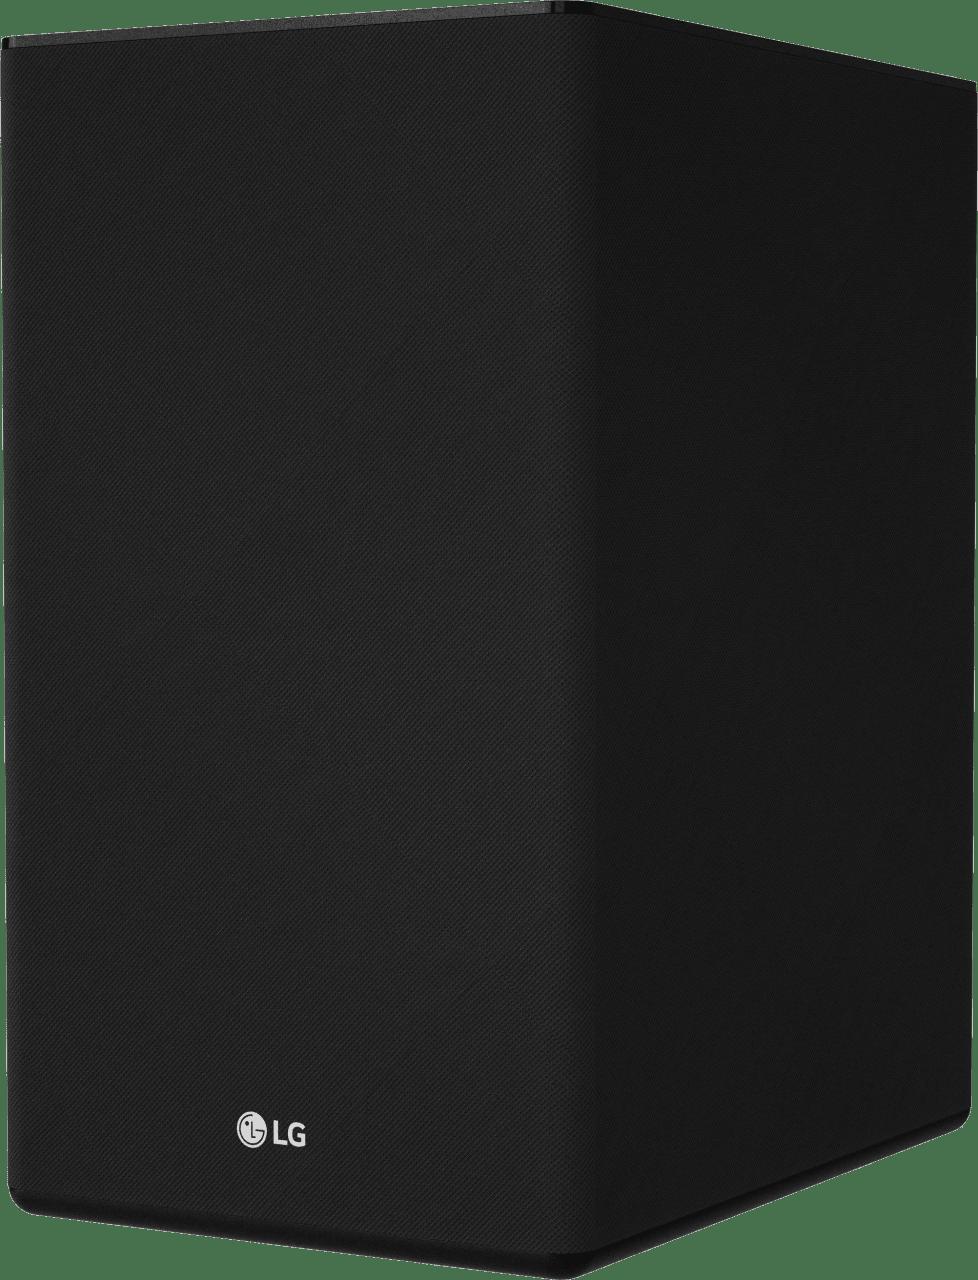 Dark Steel Silver LG DSN11RG Soundbar 7.1.4 speaker system, Dolby Atmos.5